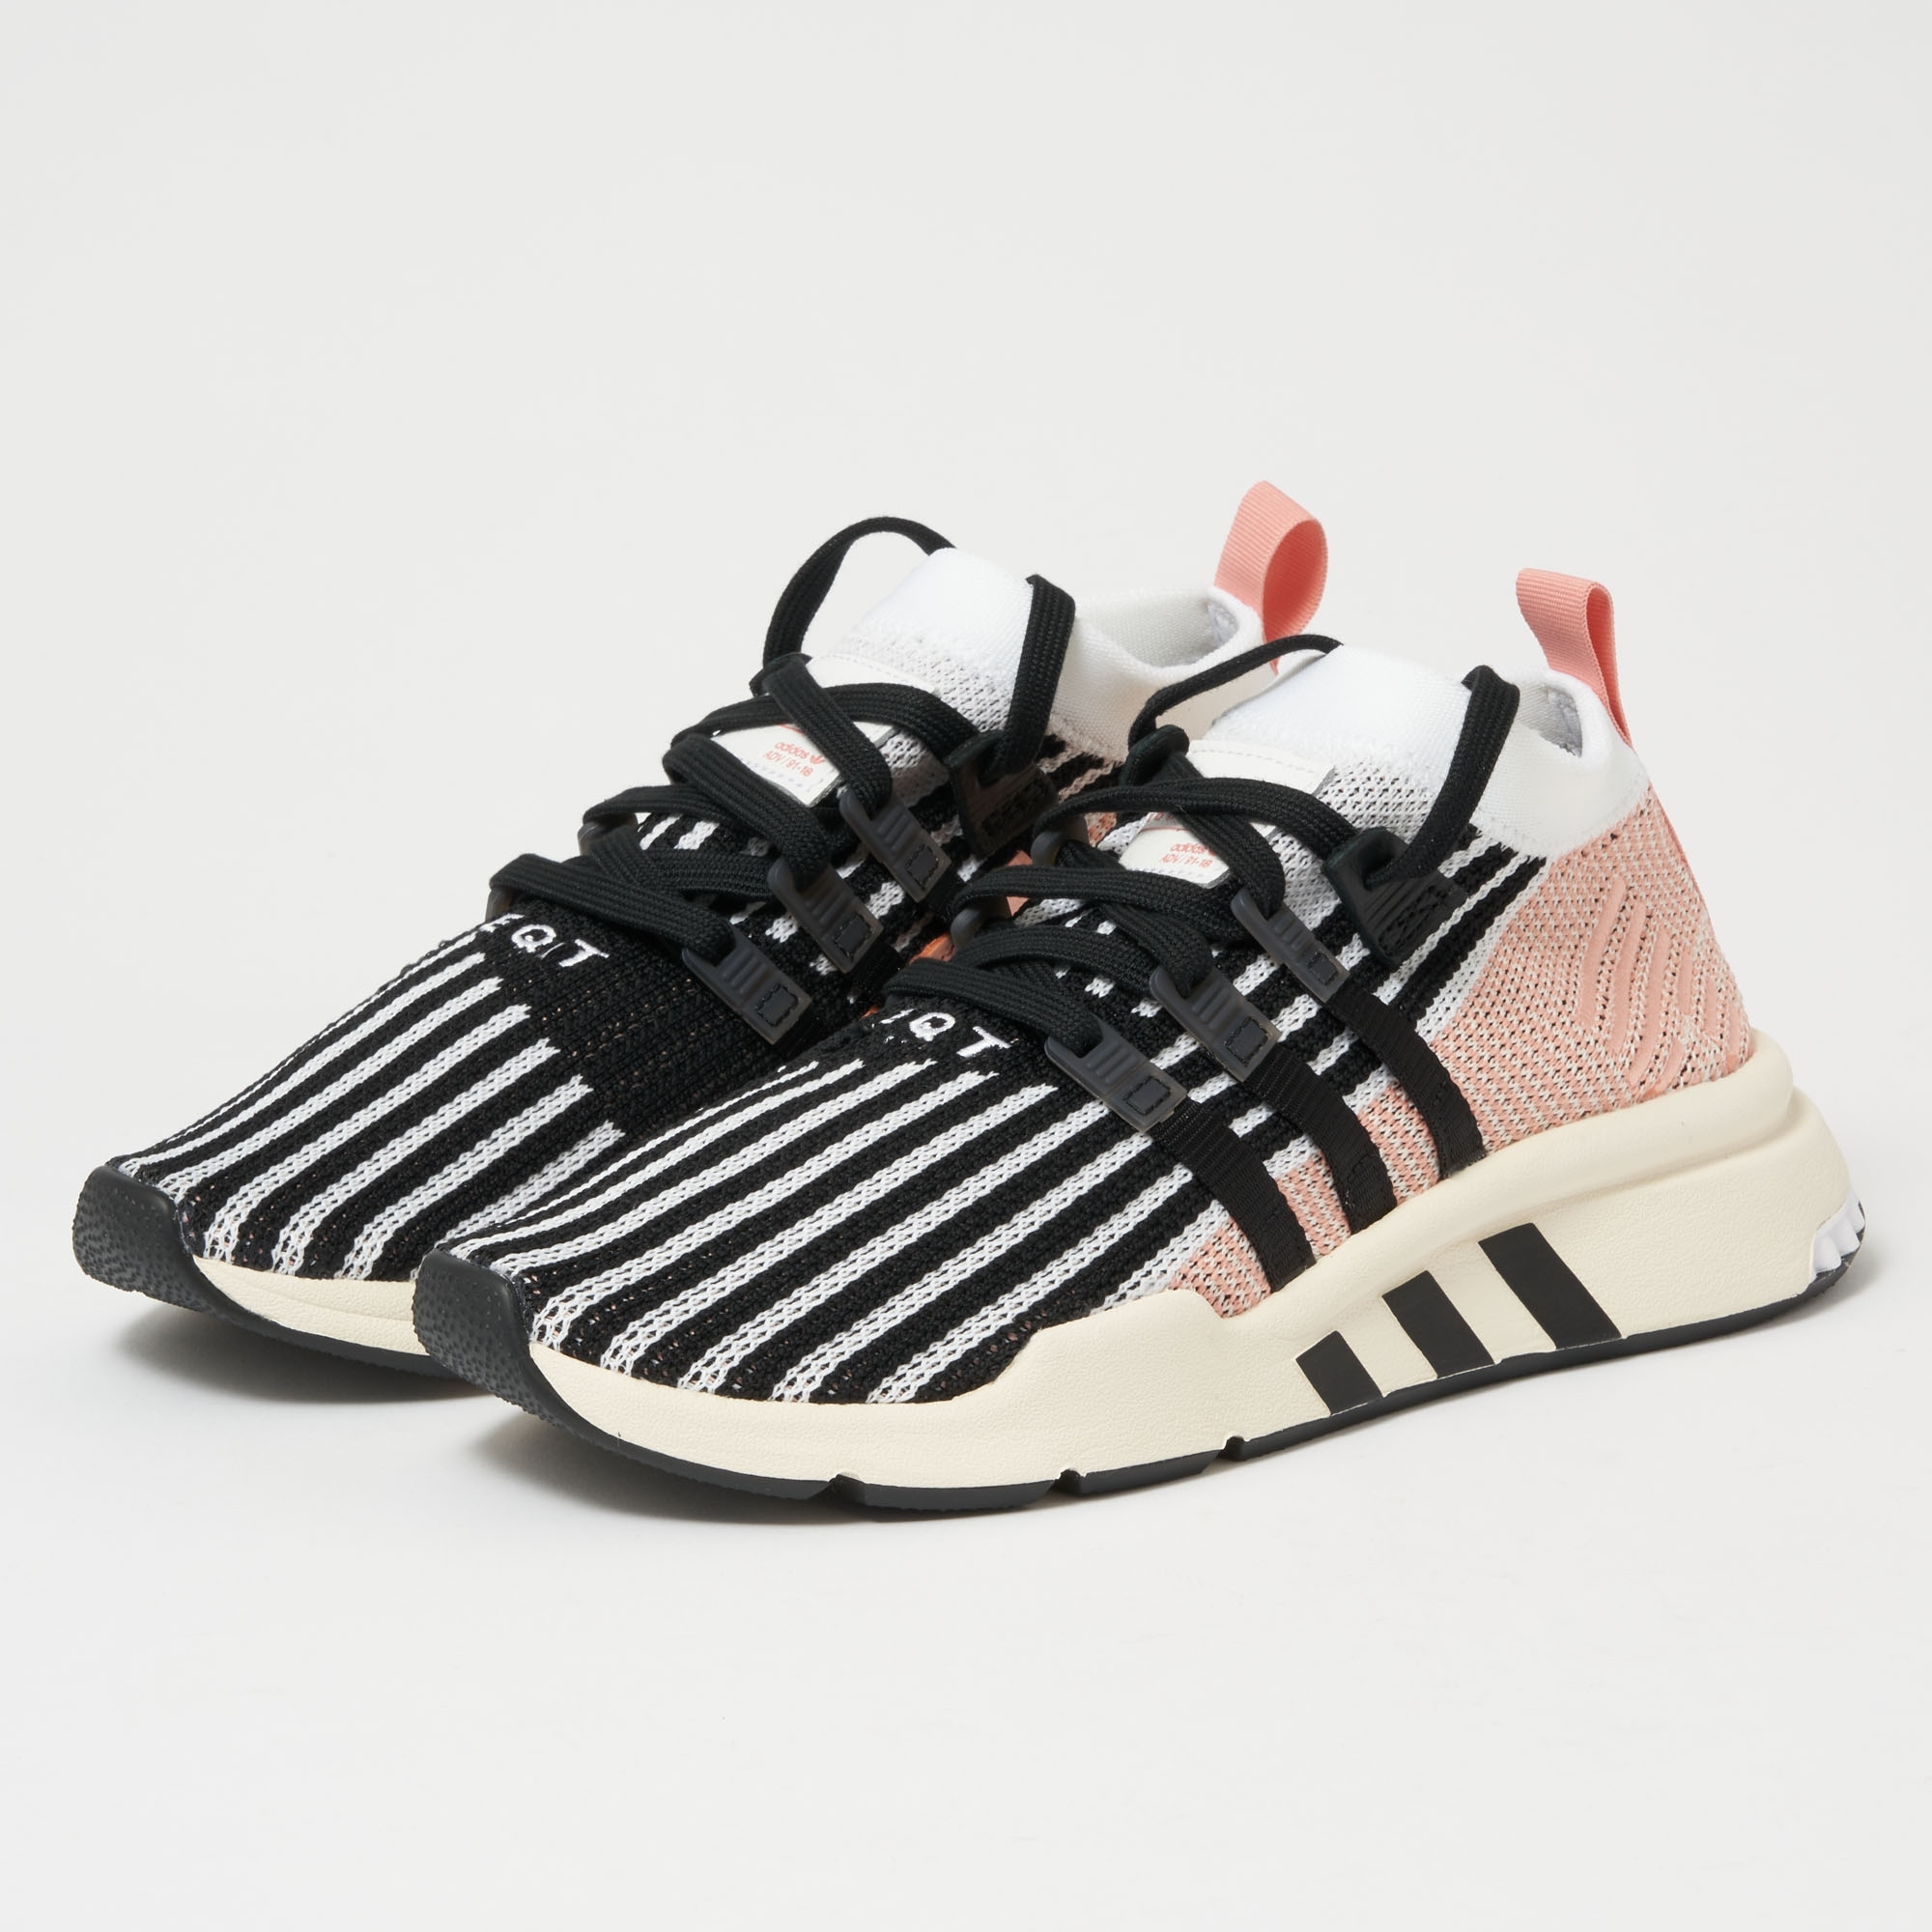 online retailer 4ebf5 3c87b Adidas EQT SUP MID ADVPrime kit WhitePink